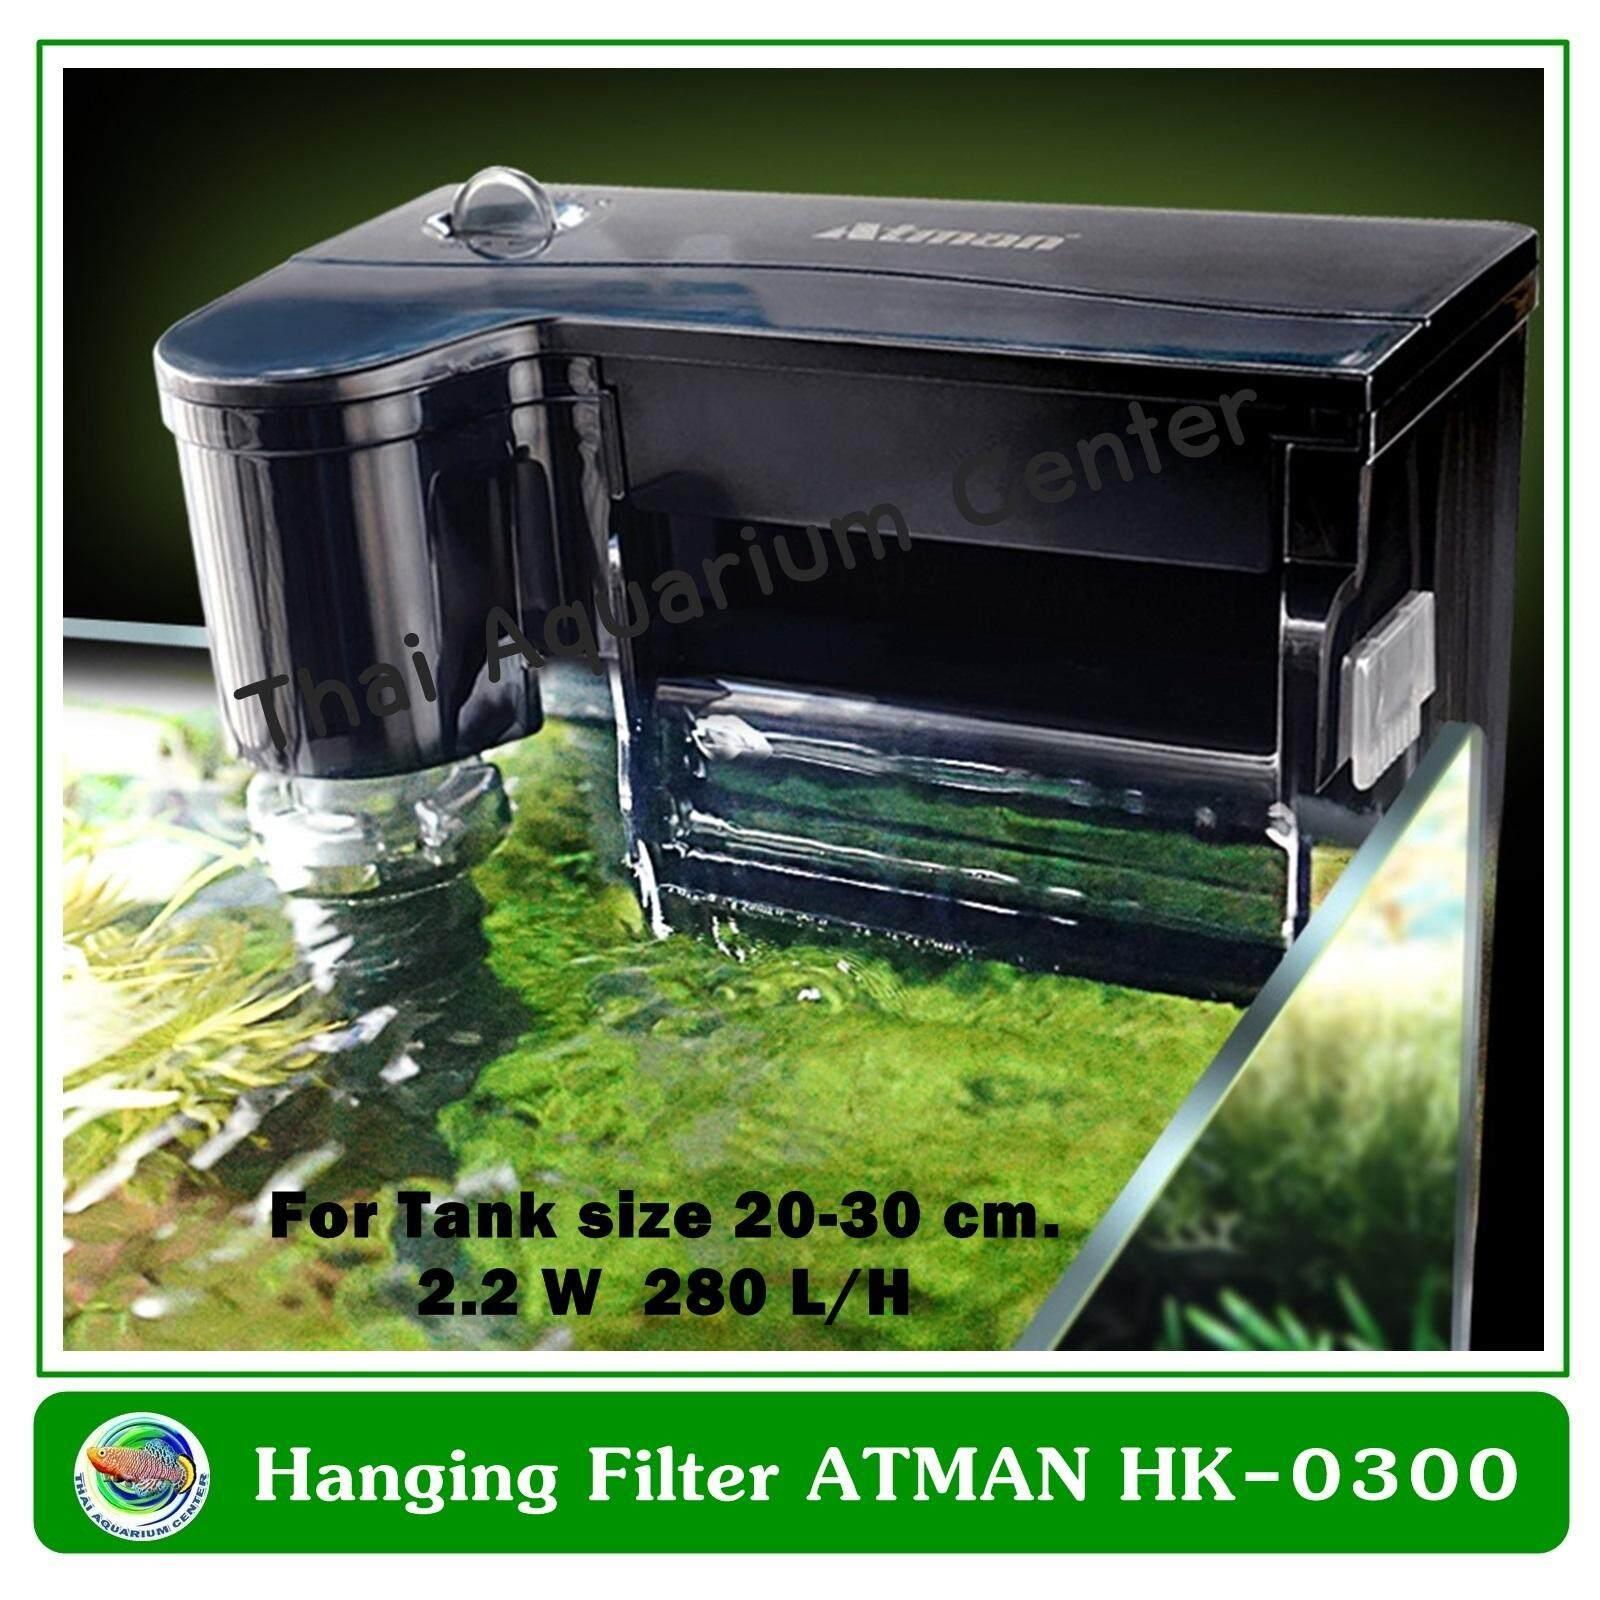 Atman Back Hanging Filter Hk-0300 กรองแขวนข้างตู้ สำหรับตู้ขนาด 20-30 ซม..